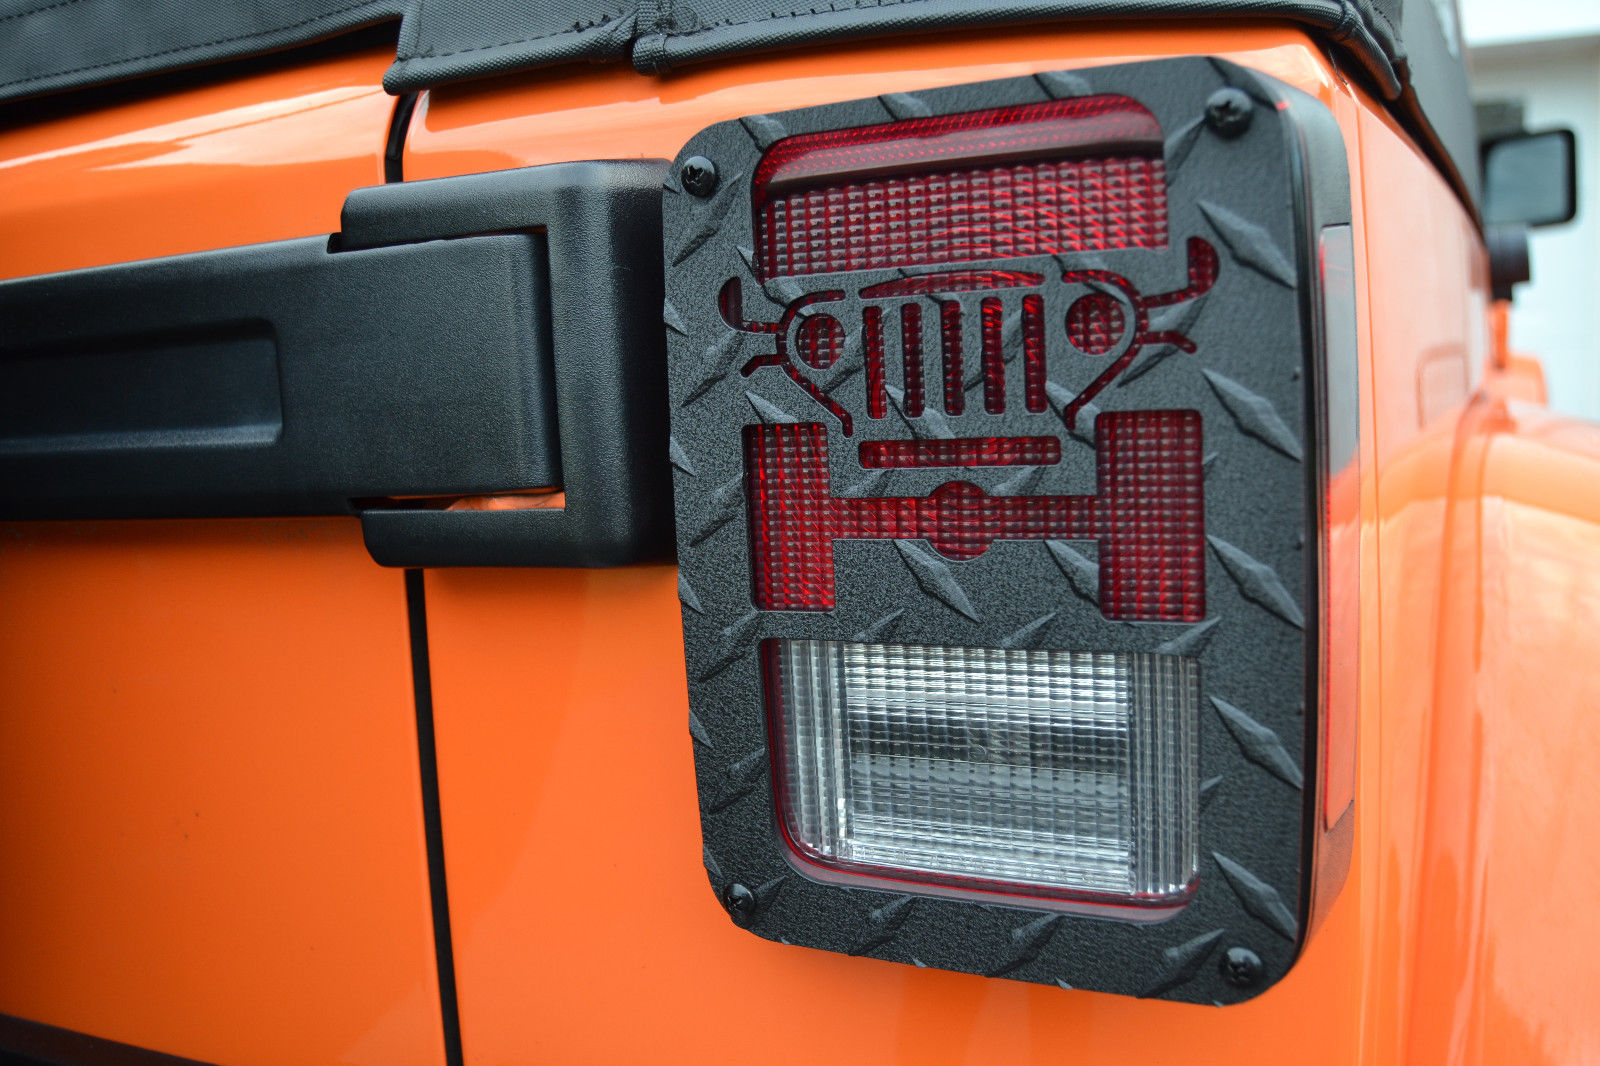 US ライトガード プロテクター ジープラングラーJK 2007-2017ジープツイークステールライトガードブラックJT01B Jeep Wrangler JK 2007-2017 Jeep Tweaks Tail Light Guards Black JT01B